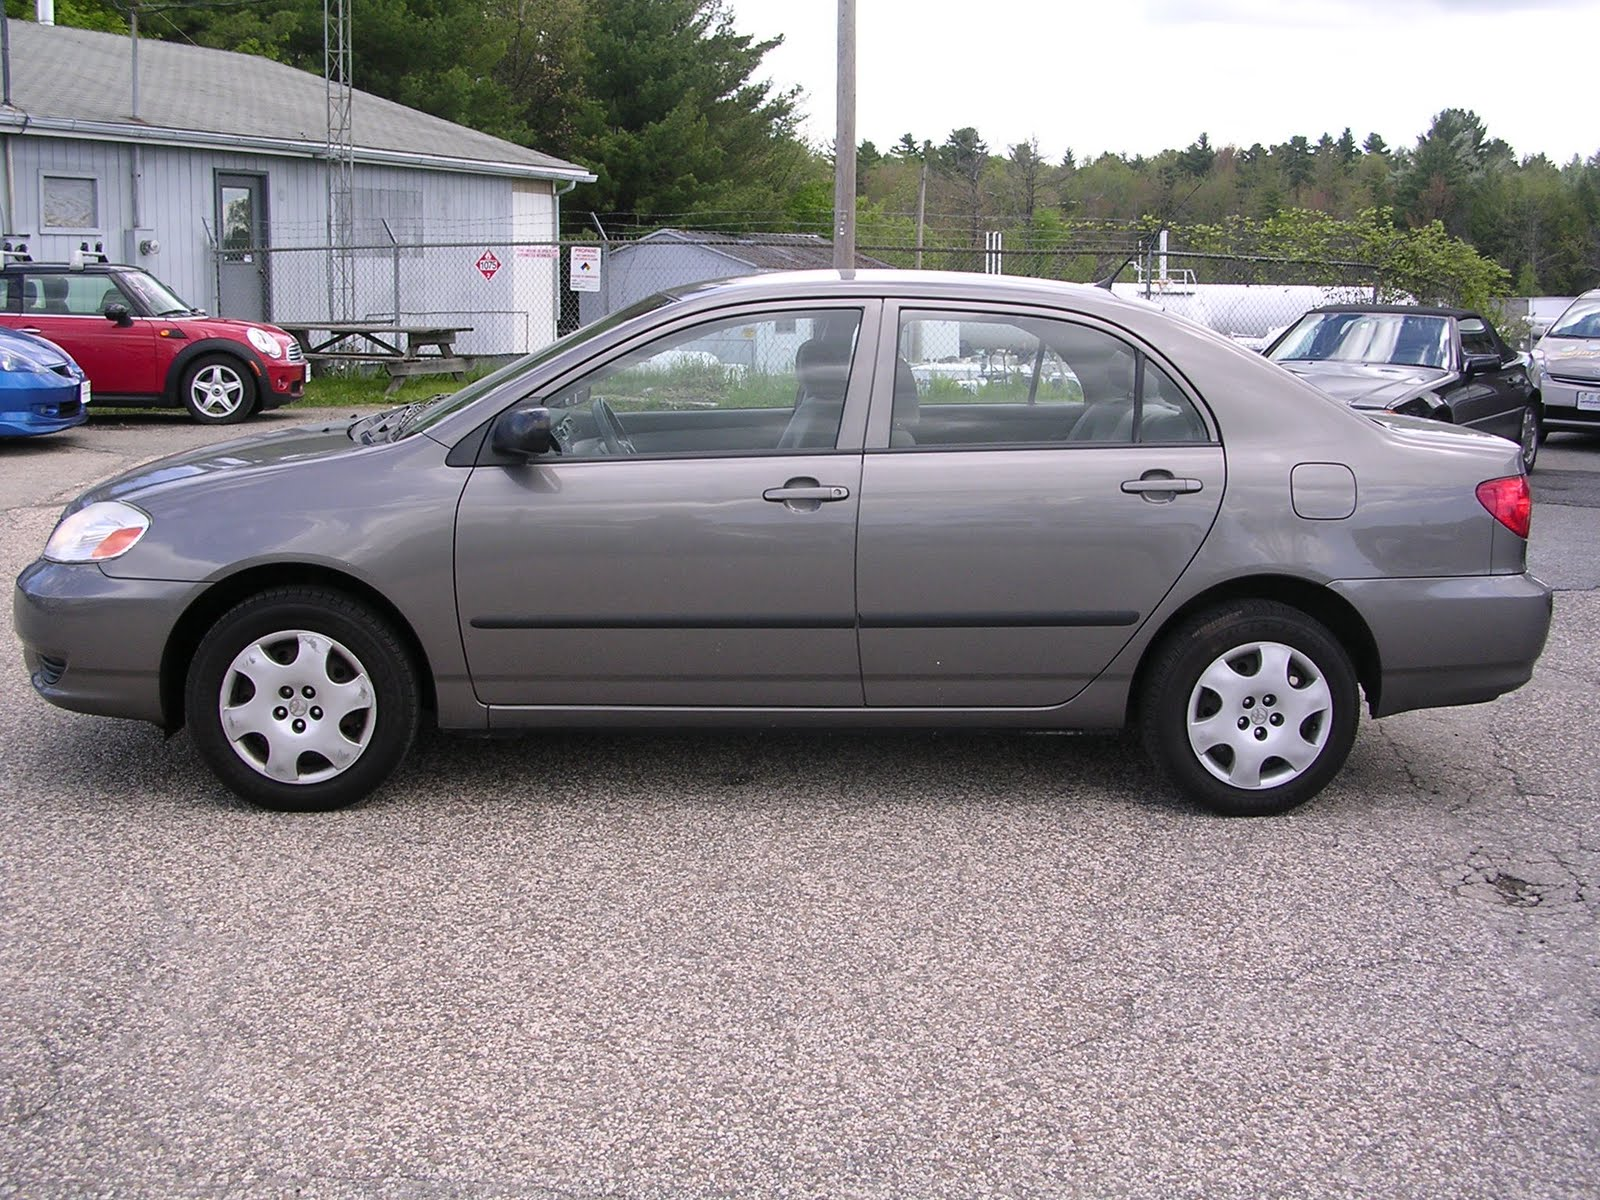 EARTHY CAR OF THE WEEK: 2003 Grey Toyota Corolla CE